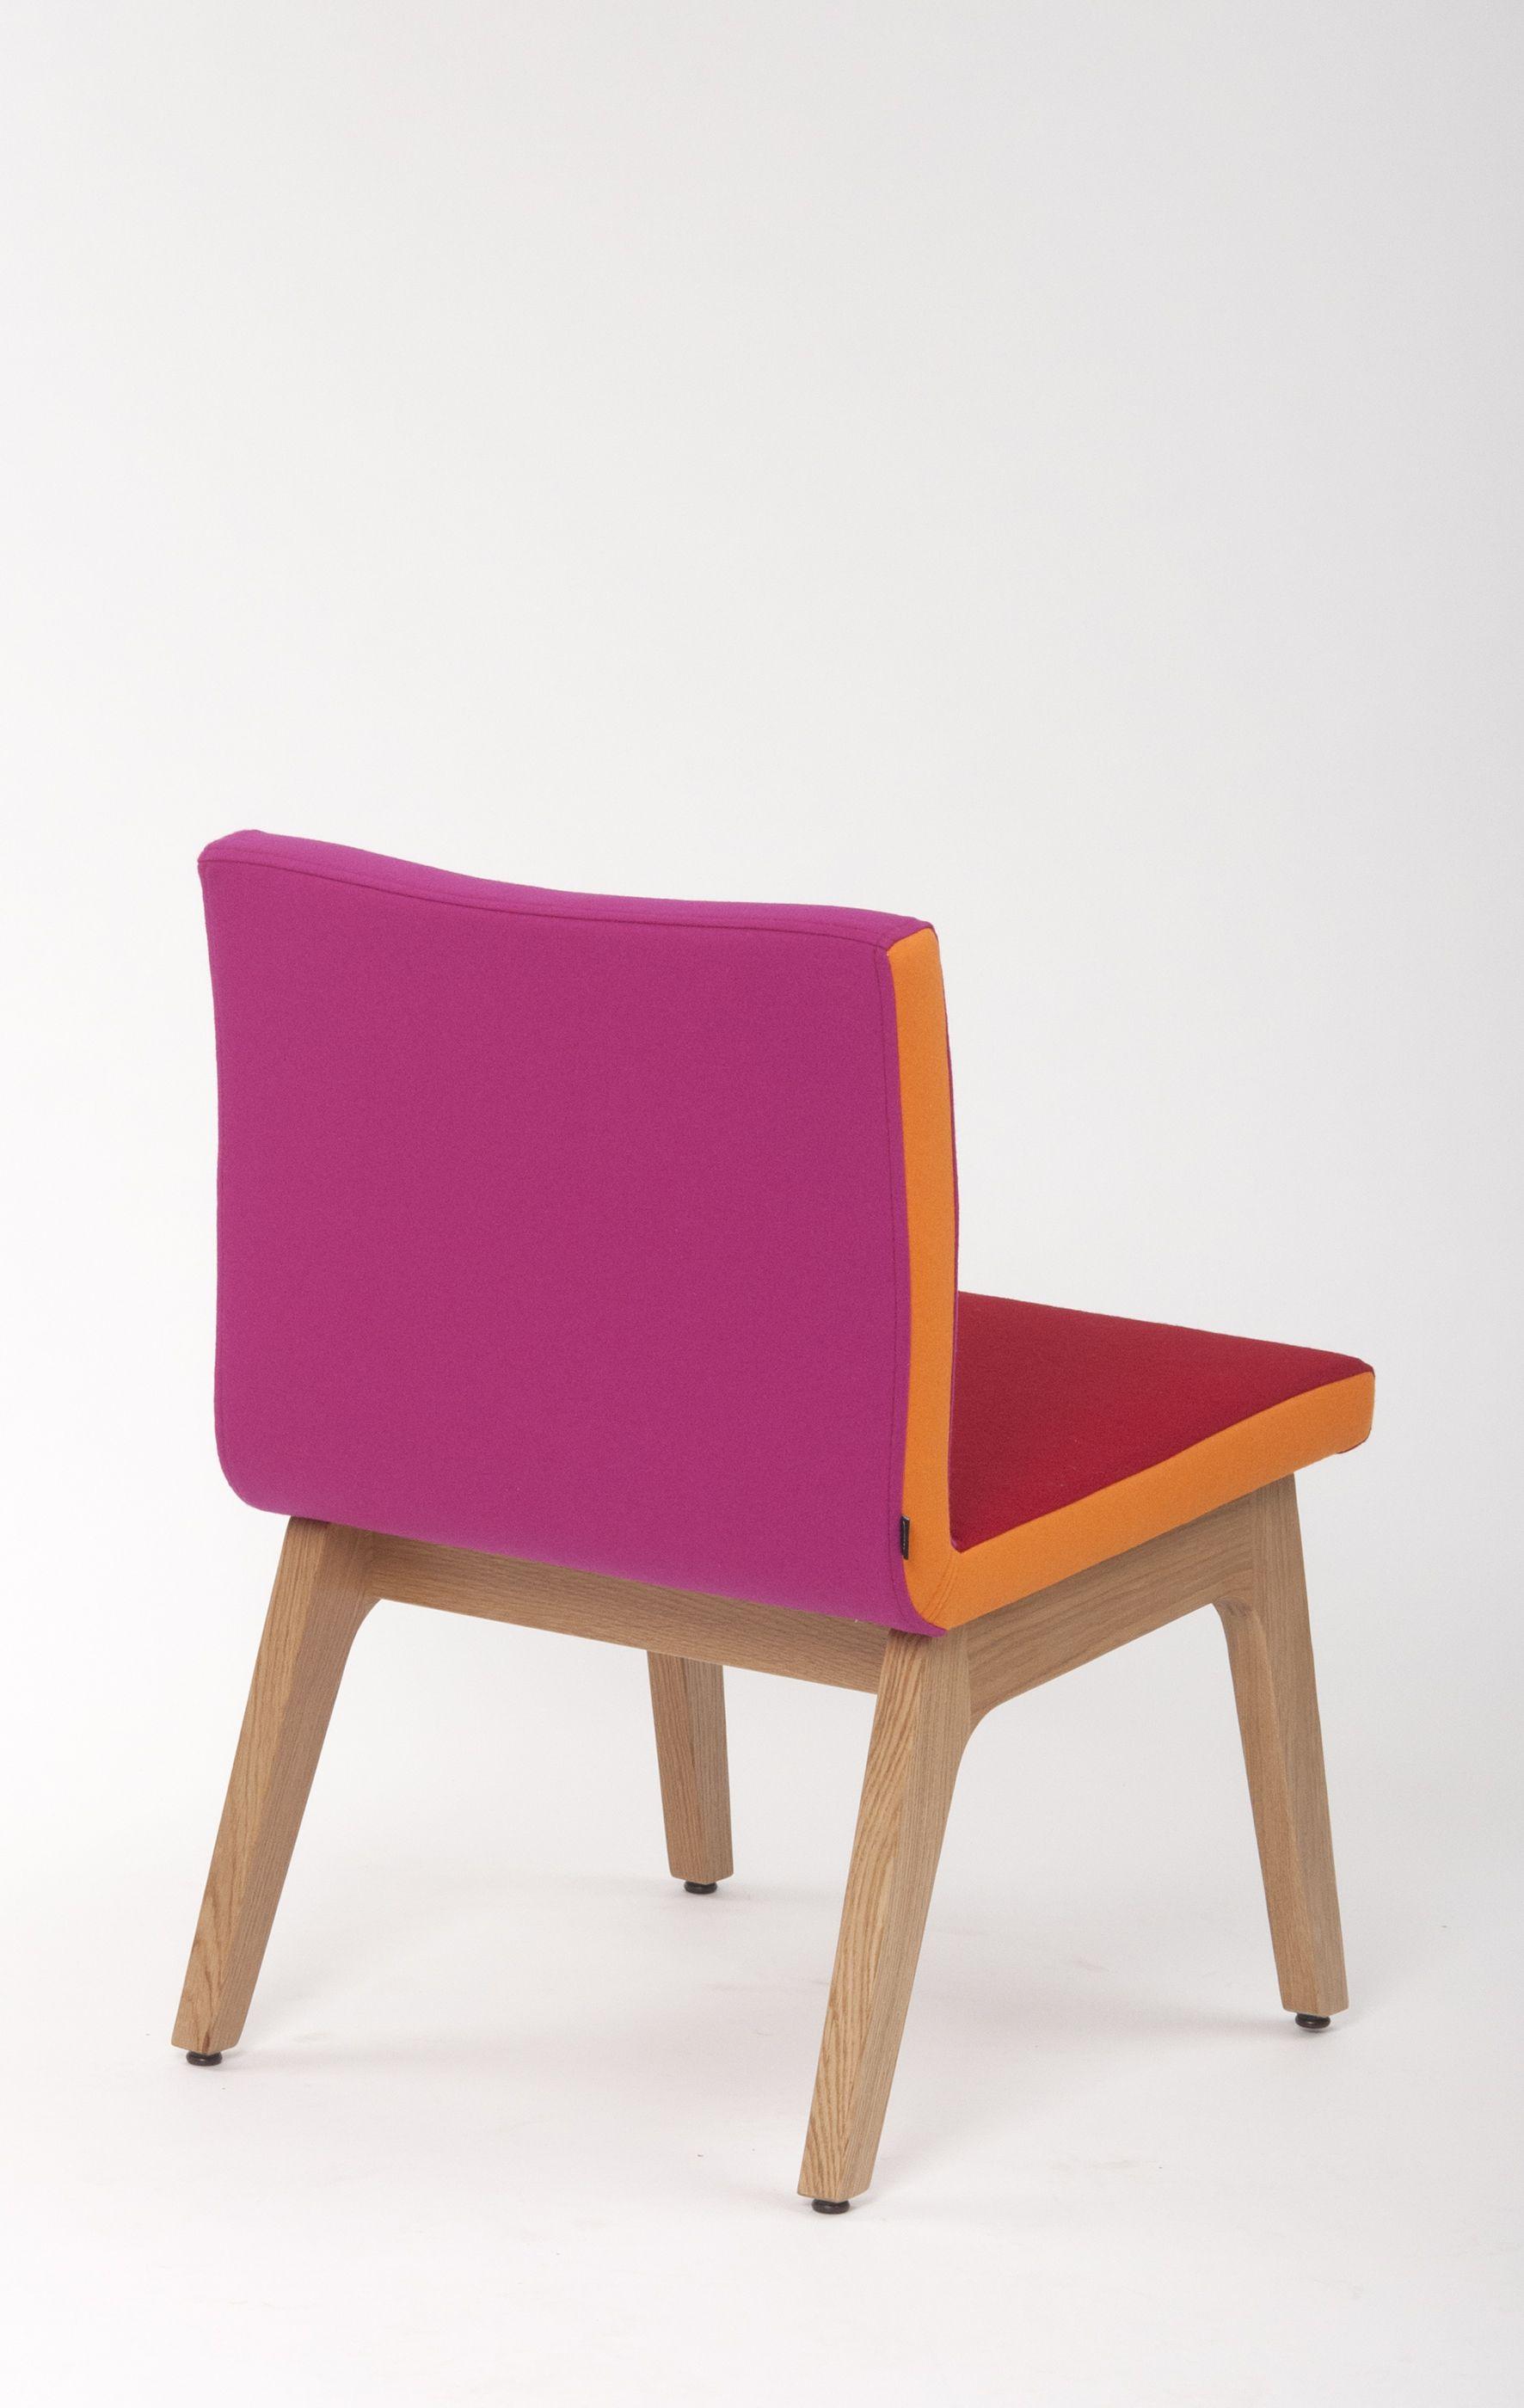 gastronomie mobel bestuhlung eiche massiv sperrholz lounge mobel sitzen sessel